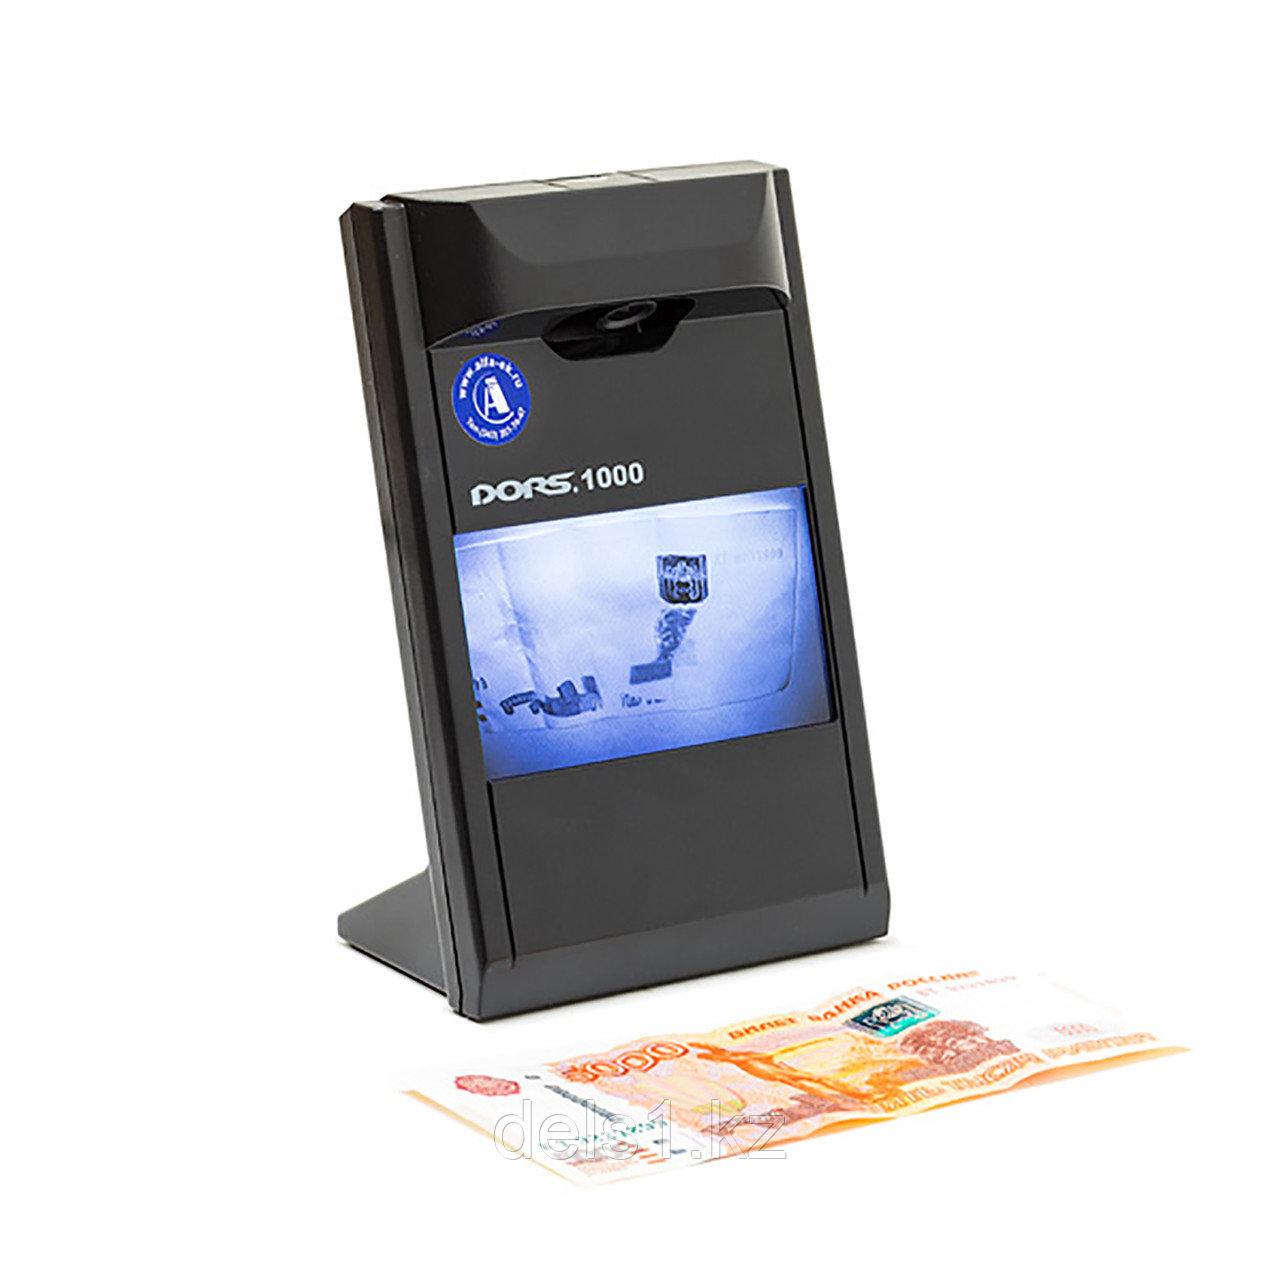 Детектор банкнот DORS 1000